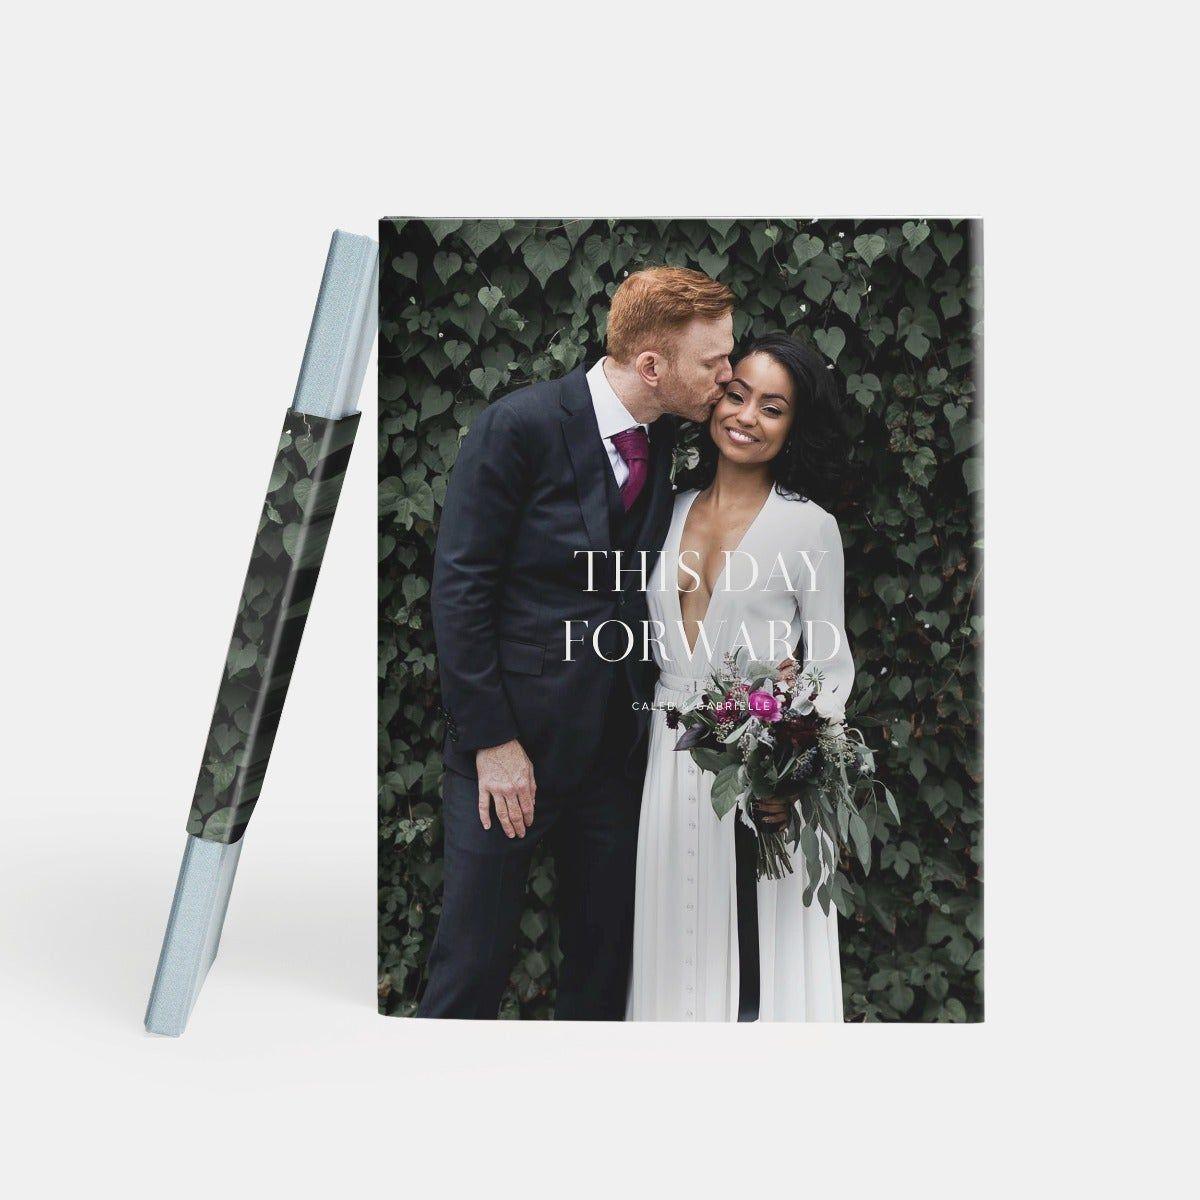 15 Best Wedding Photo Albums 2020 Best Photo Albums